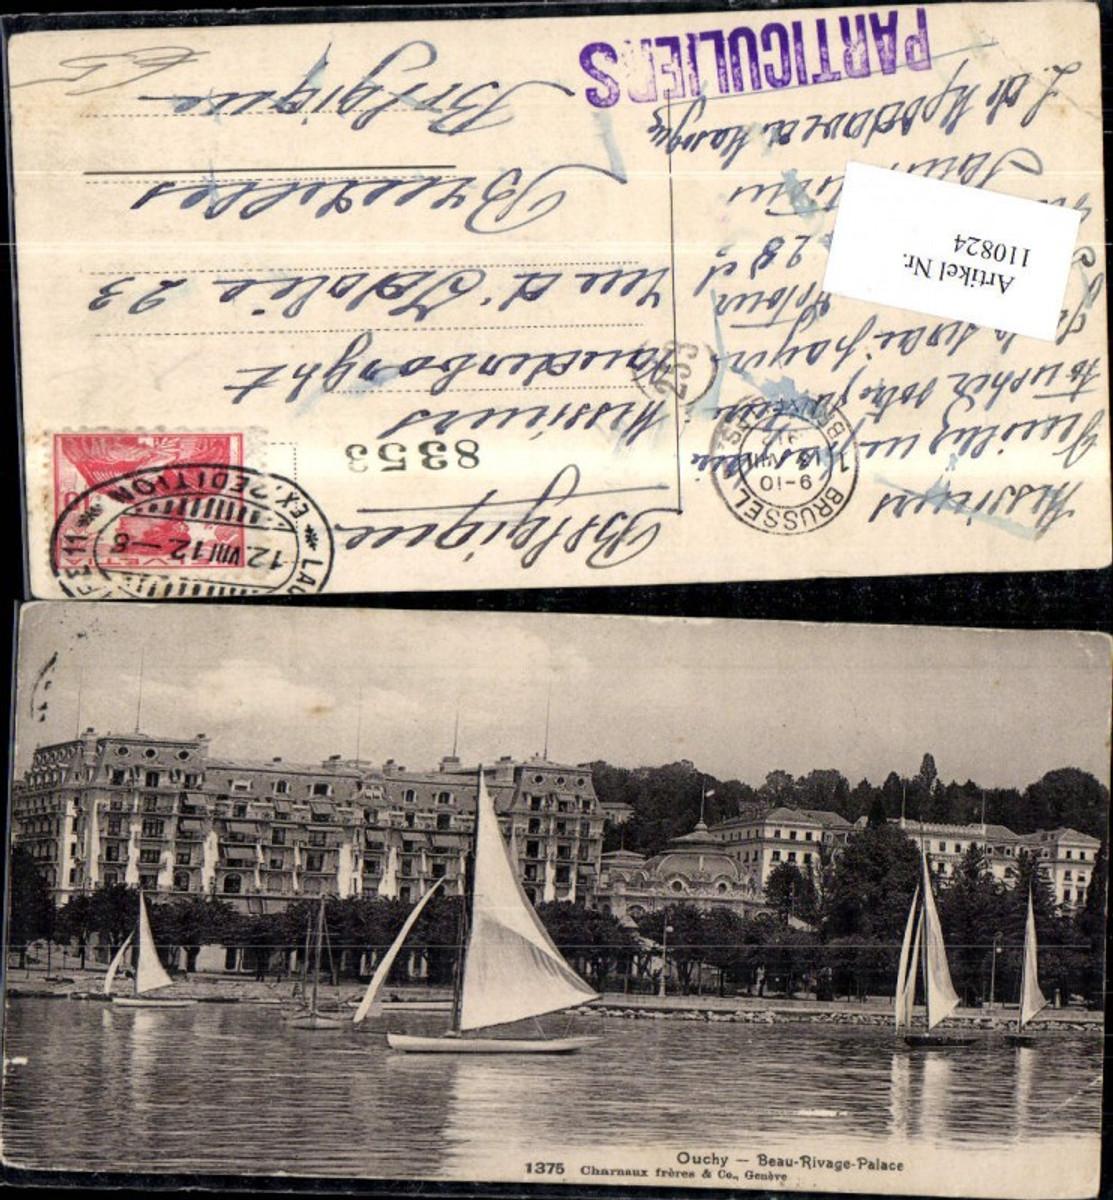 110824,Ouchy Beau Rivage Palace Segelboot 1912 Kanton Waadt günstig online kaufen